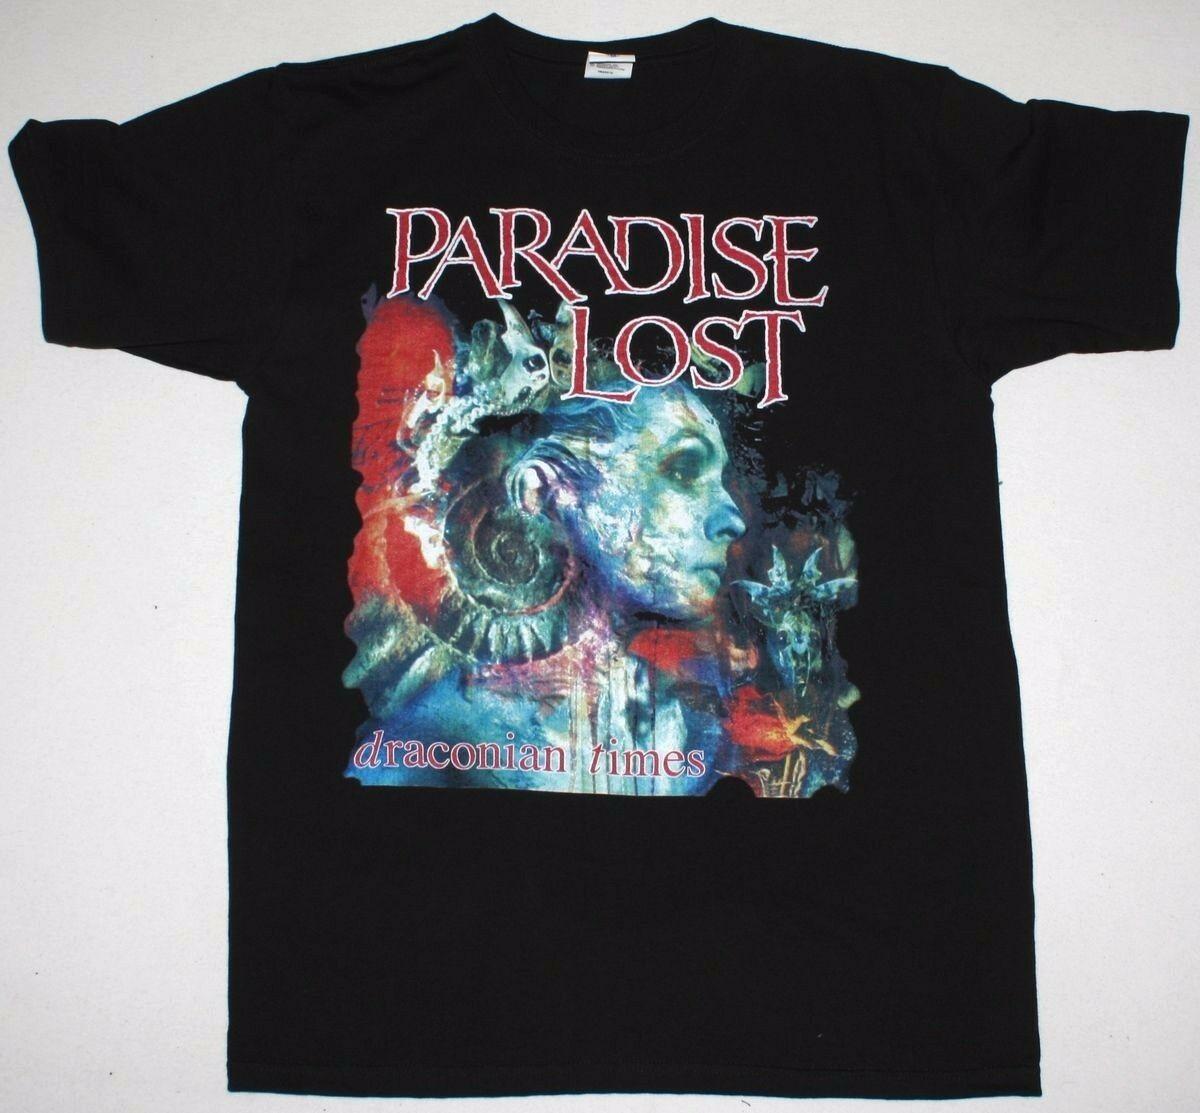 Paradise Lost end of Draco era gothic metal new black T-shirt custom short sleeve